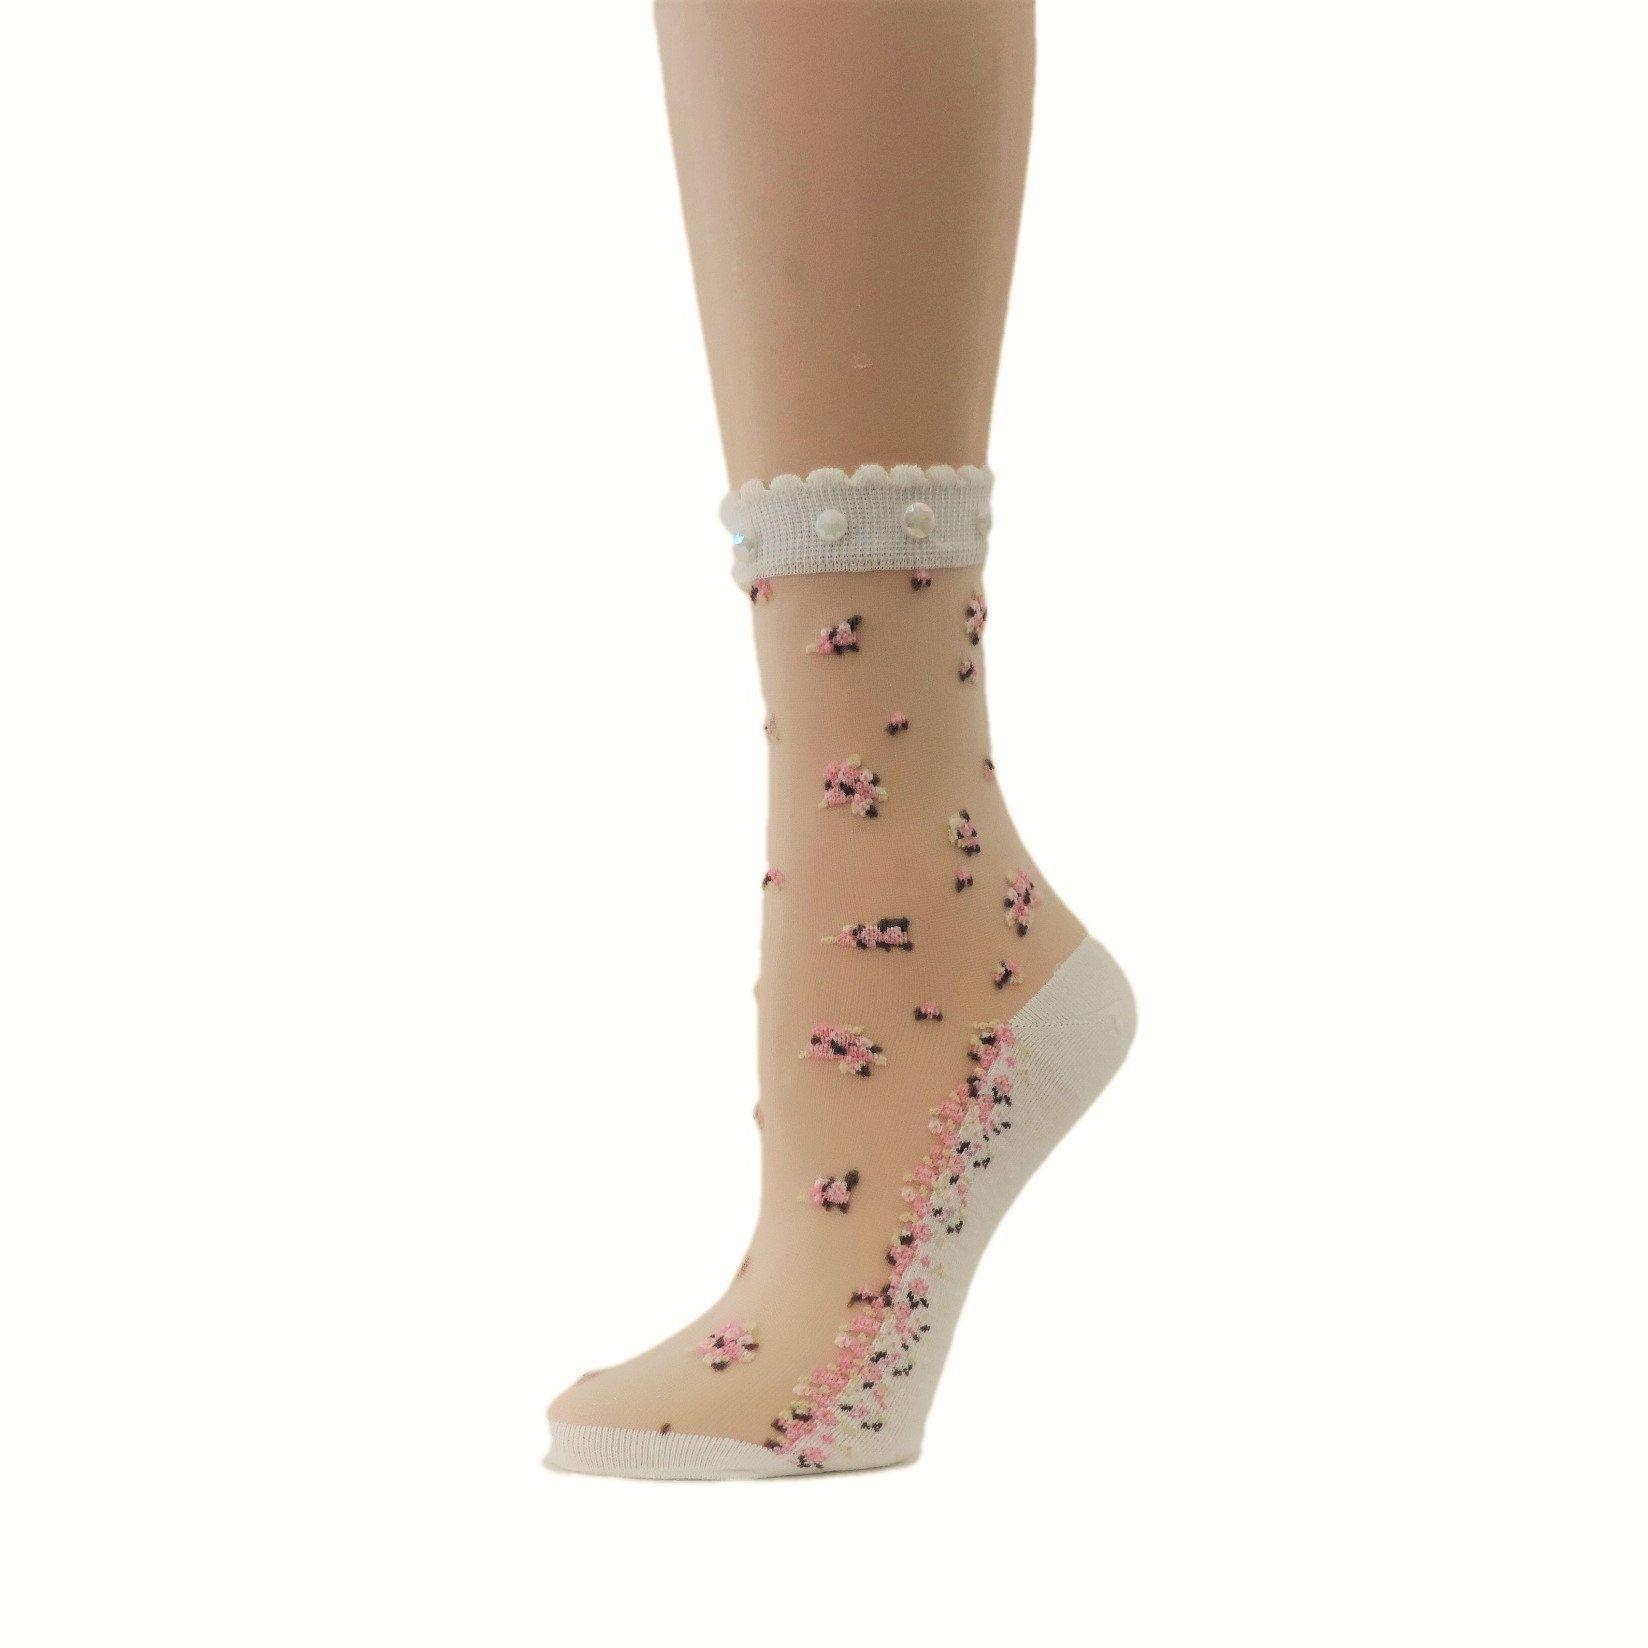 9c808c298 Women Sheer Socks/Hand Beads Work/Beads Sequence Work/Women Socks/Crystal  Lace/Transparent Socks/Fancy Socks/Fashion Socks/Floral Socks/ by  GlobalTrendzShop ...